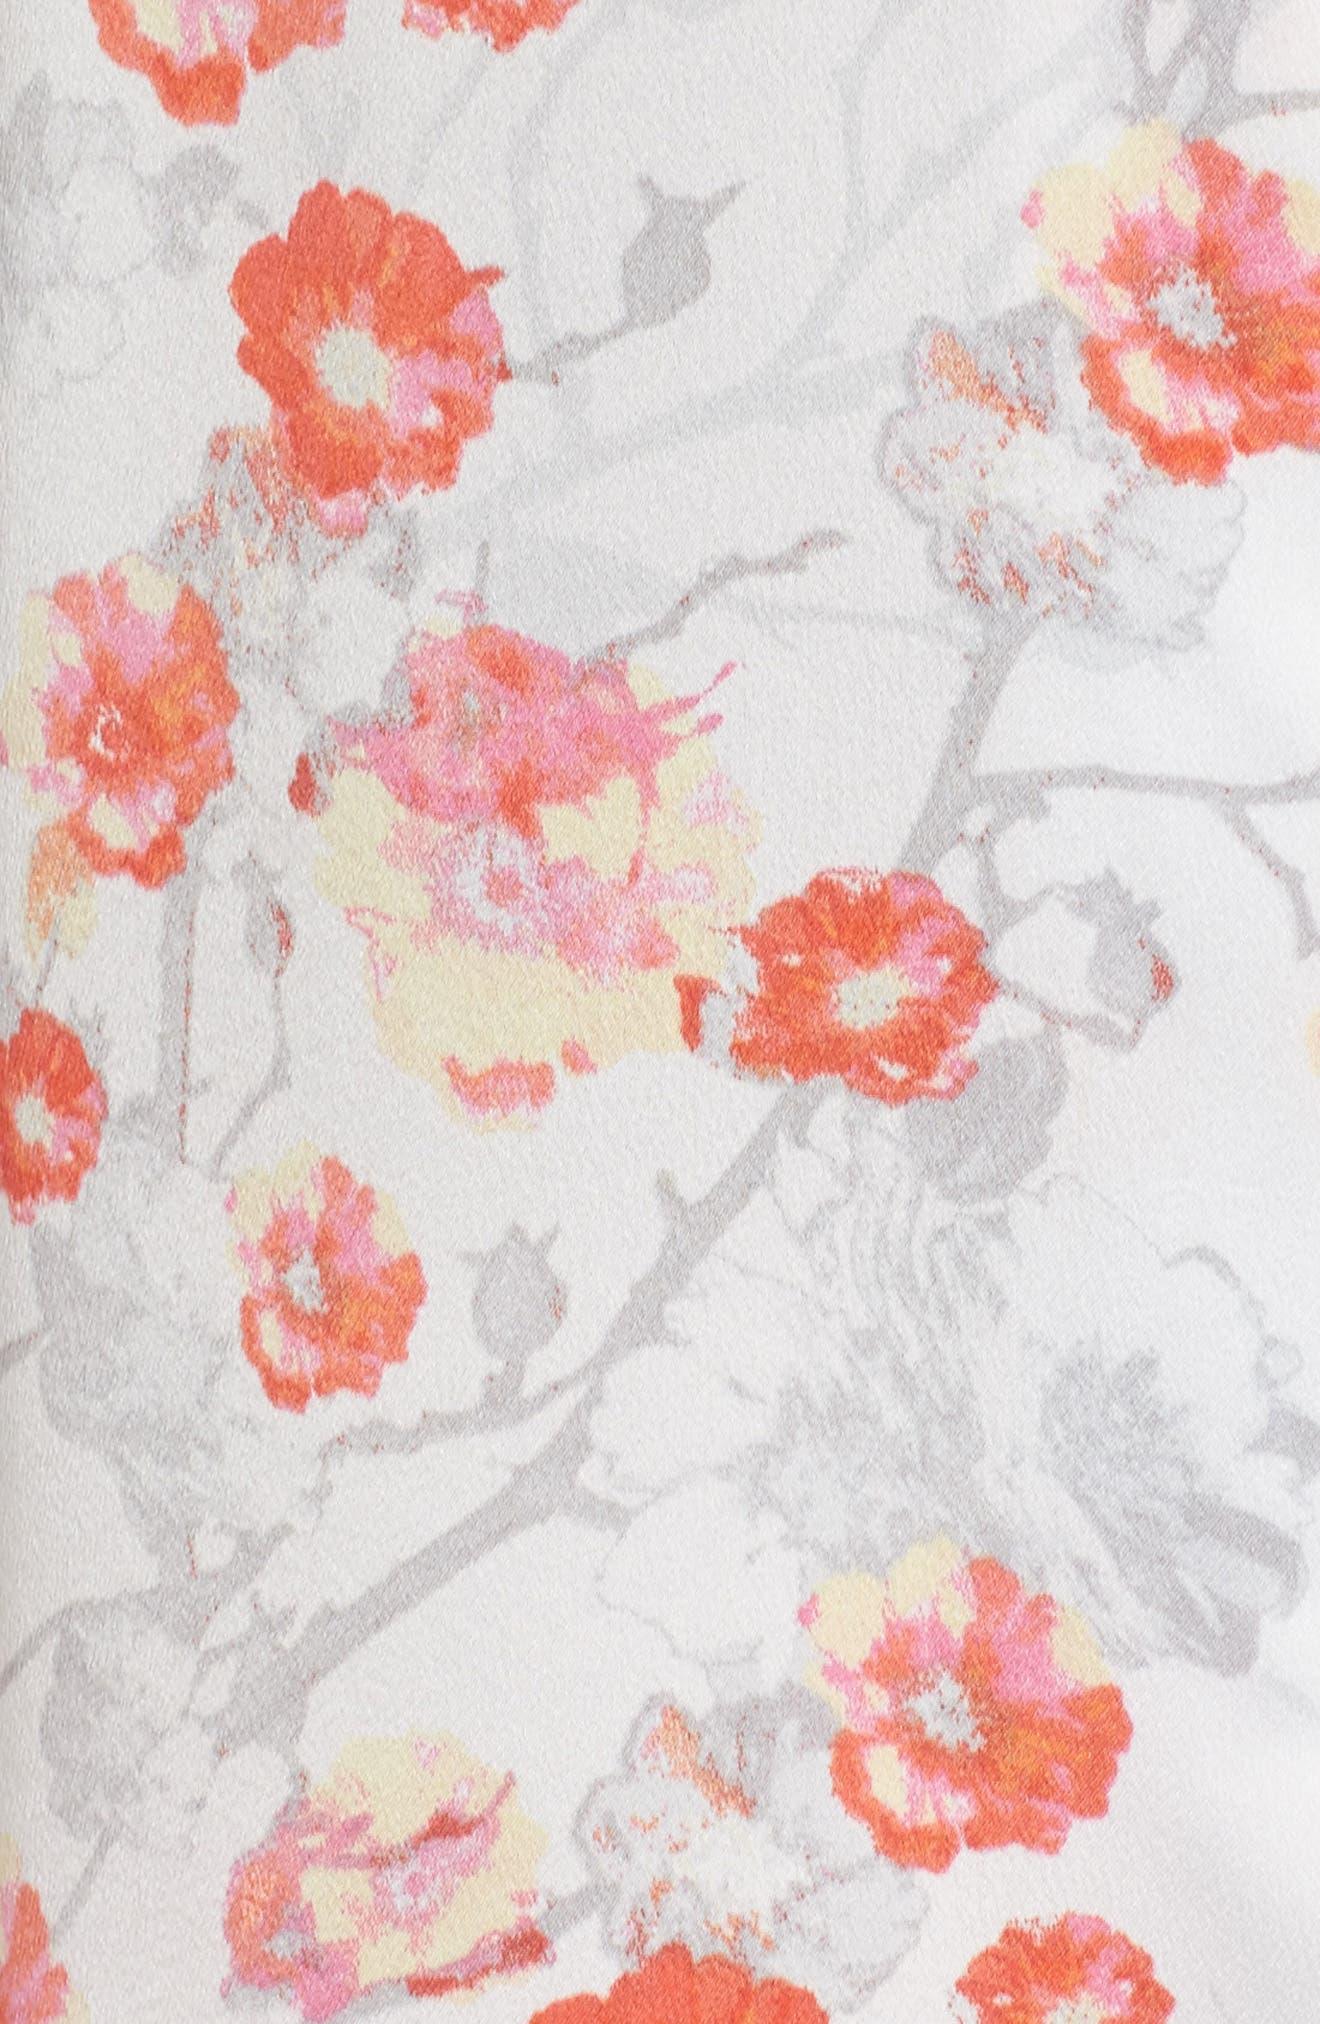 Blossom Print Satin Pajamas,                             Alternate thumbnail 5, color,                             905